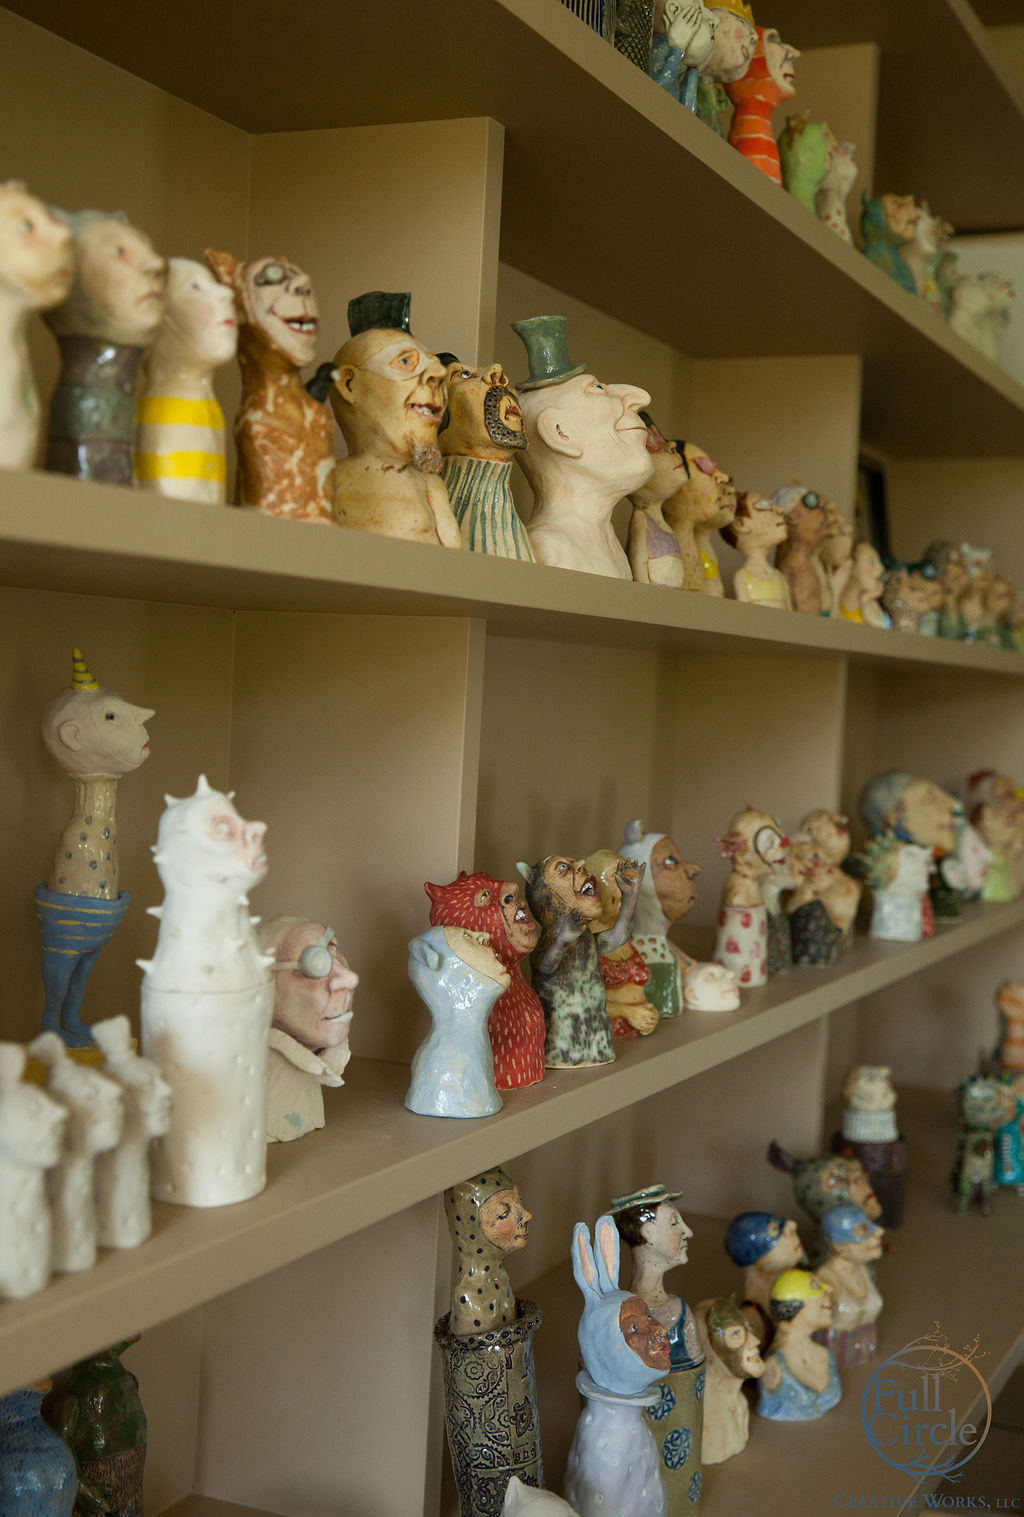 My sculptures in their studio space